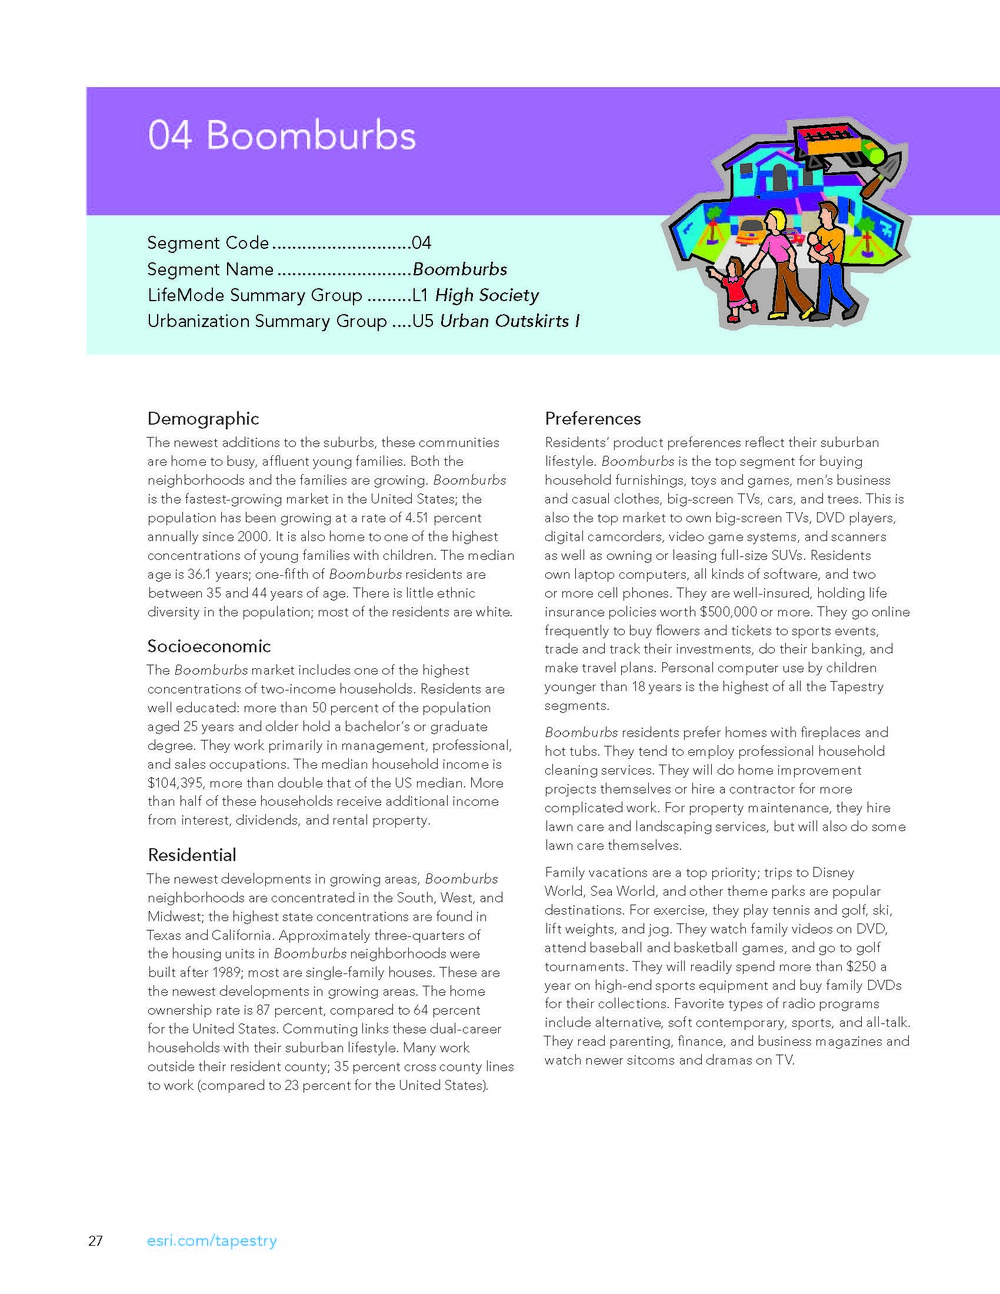 tapestry-segmentation_Page_30.jpg